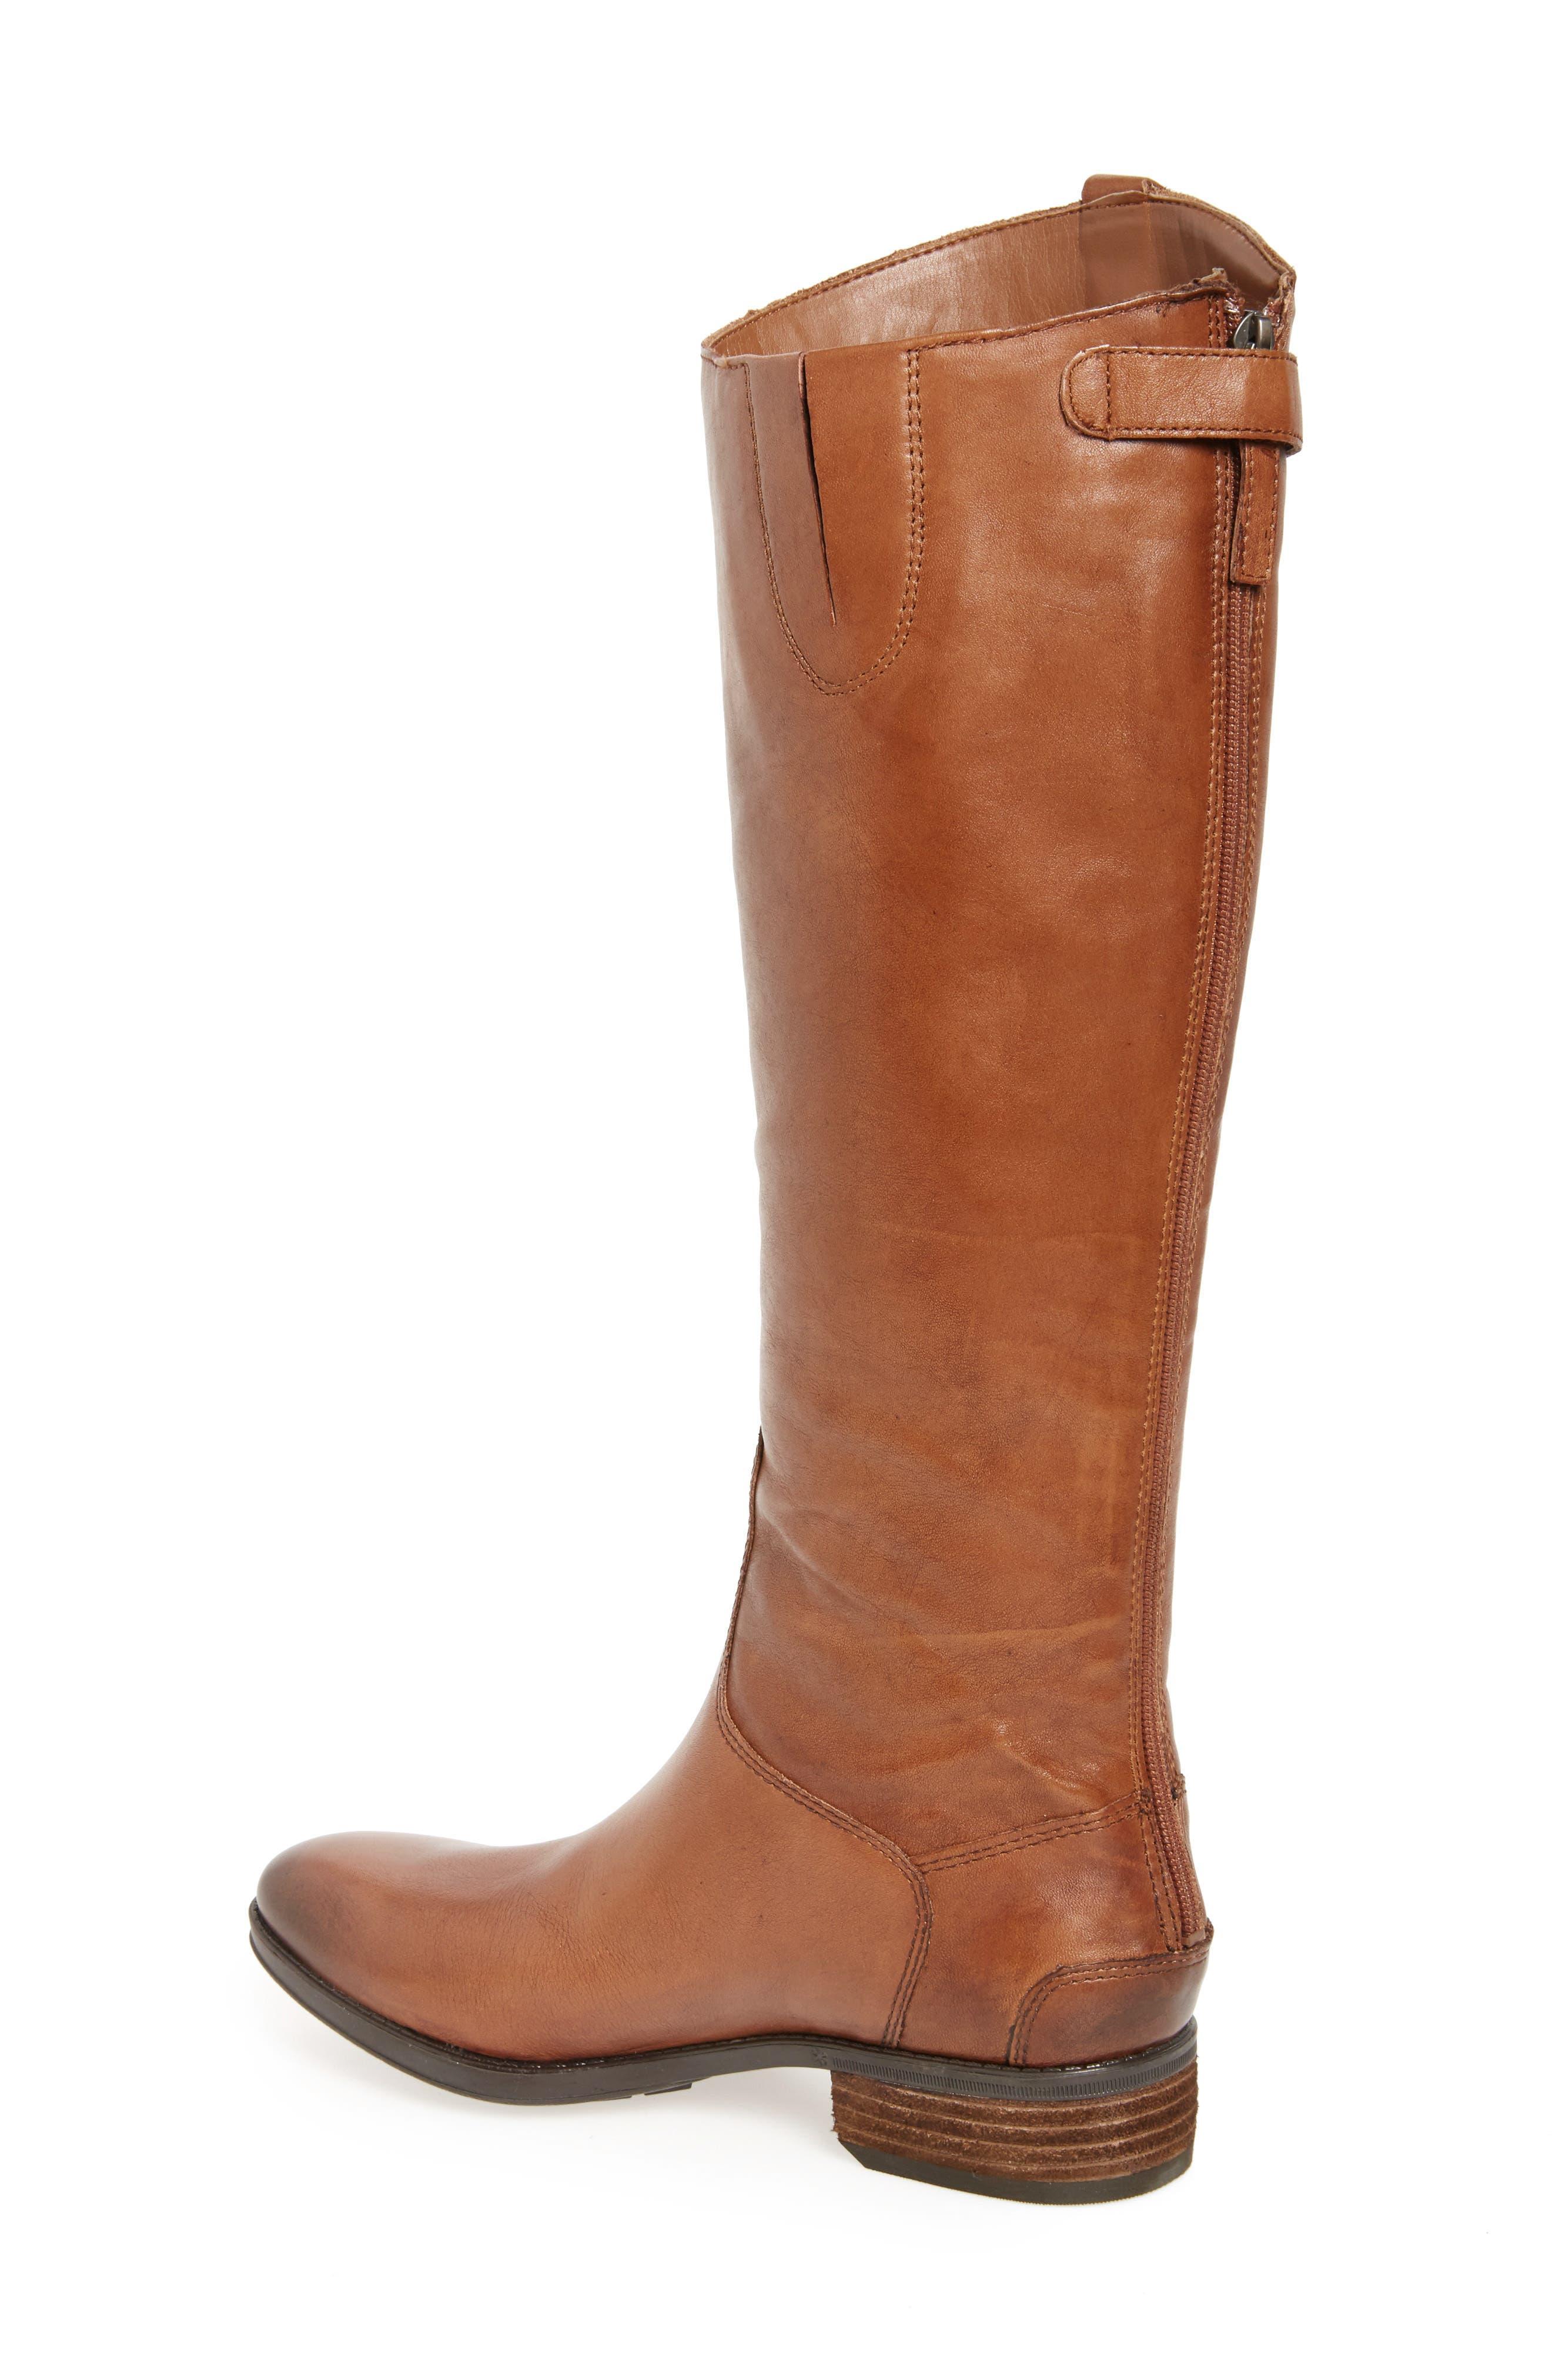 1d913c688d6 Women's Boots | Nordstrom